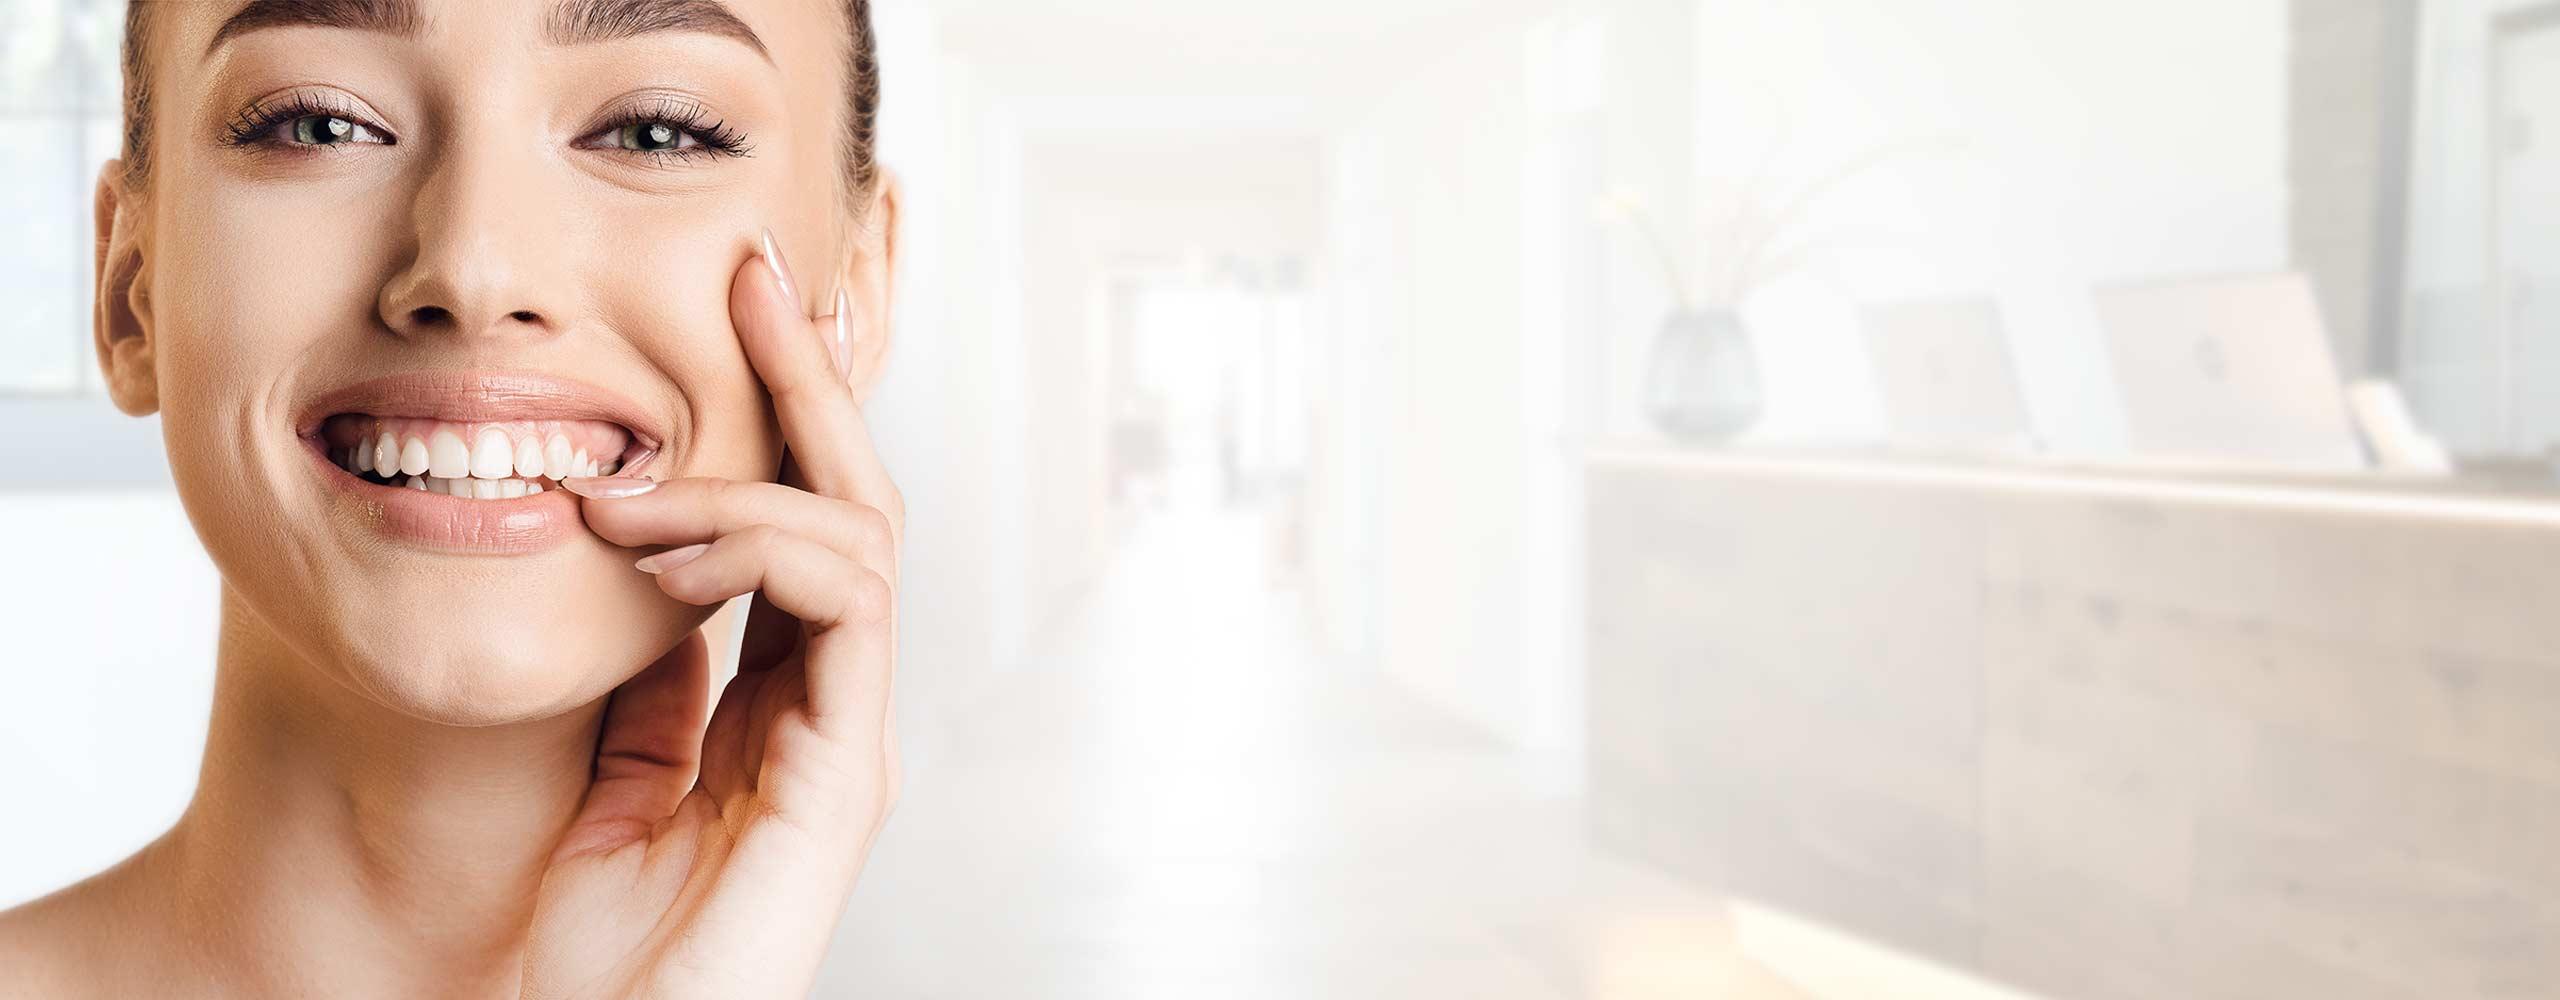 proaesthetic heidelberg schoenheitsklinik unterspritzungen gummysmile